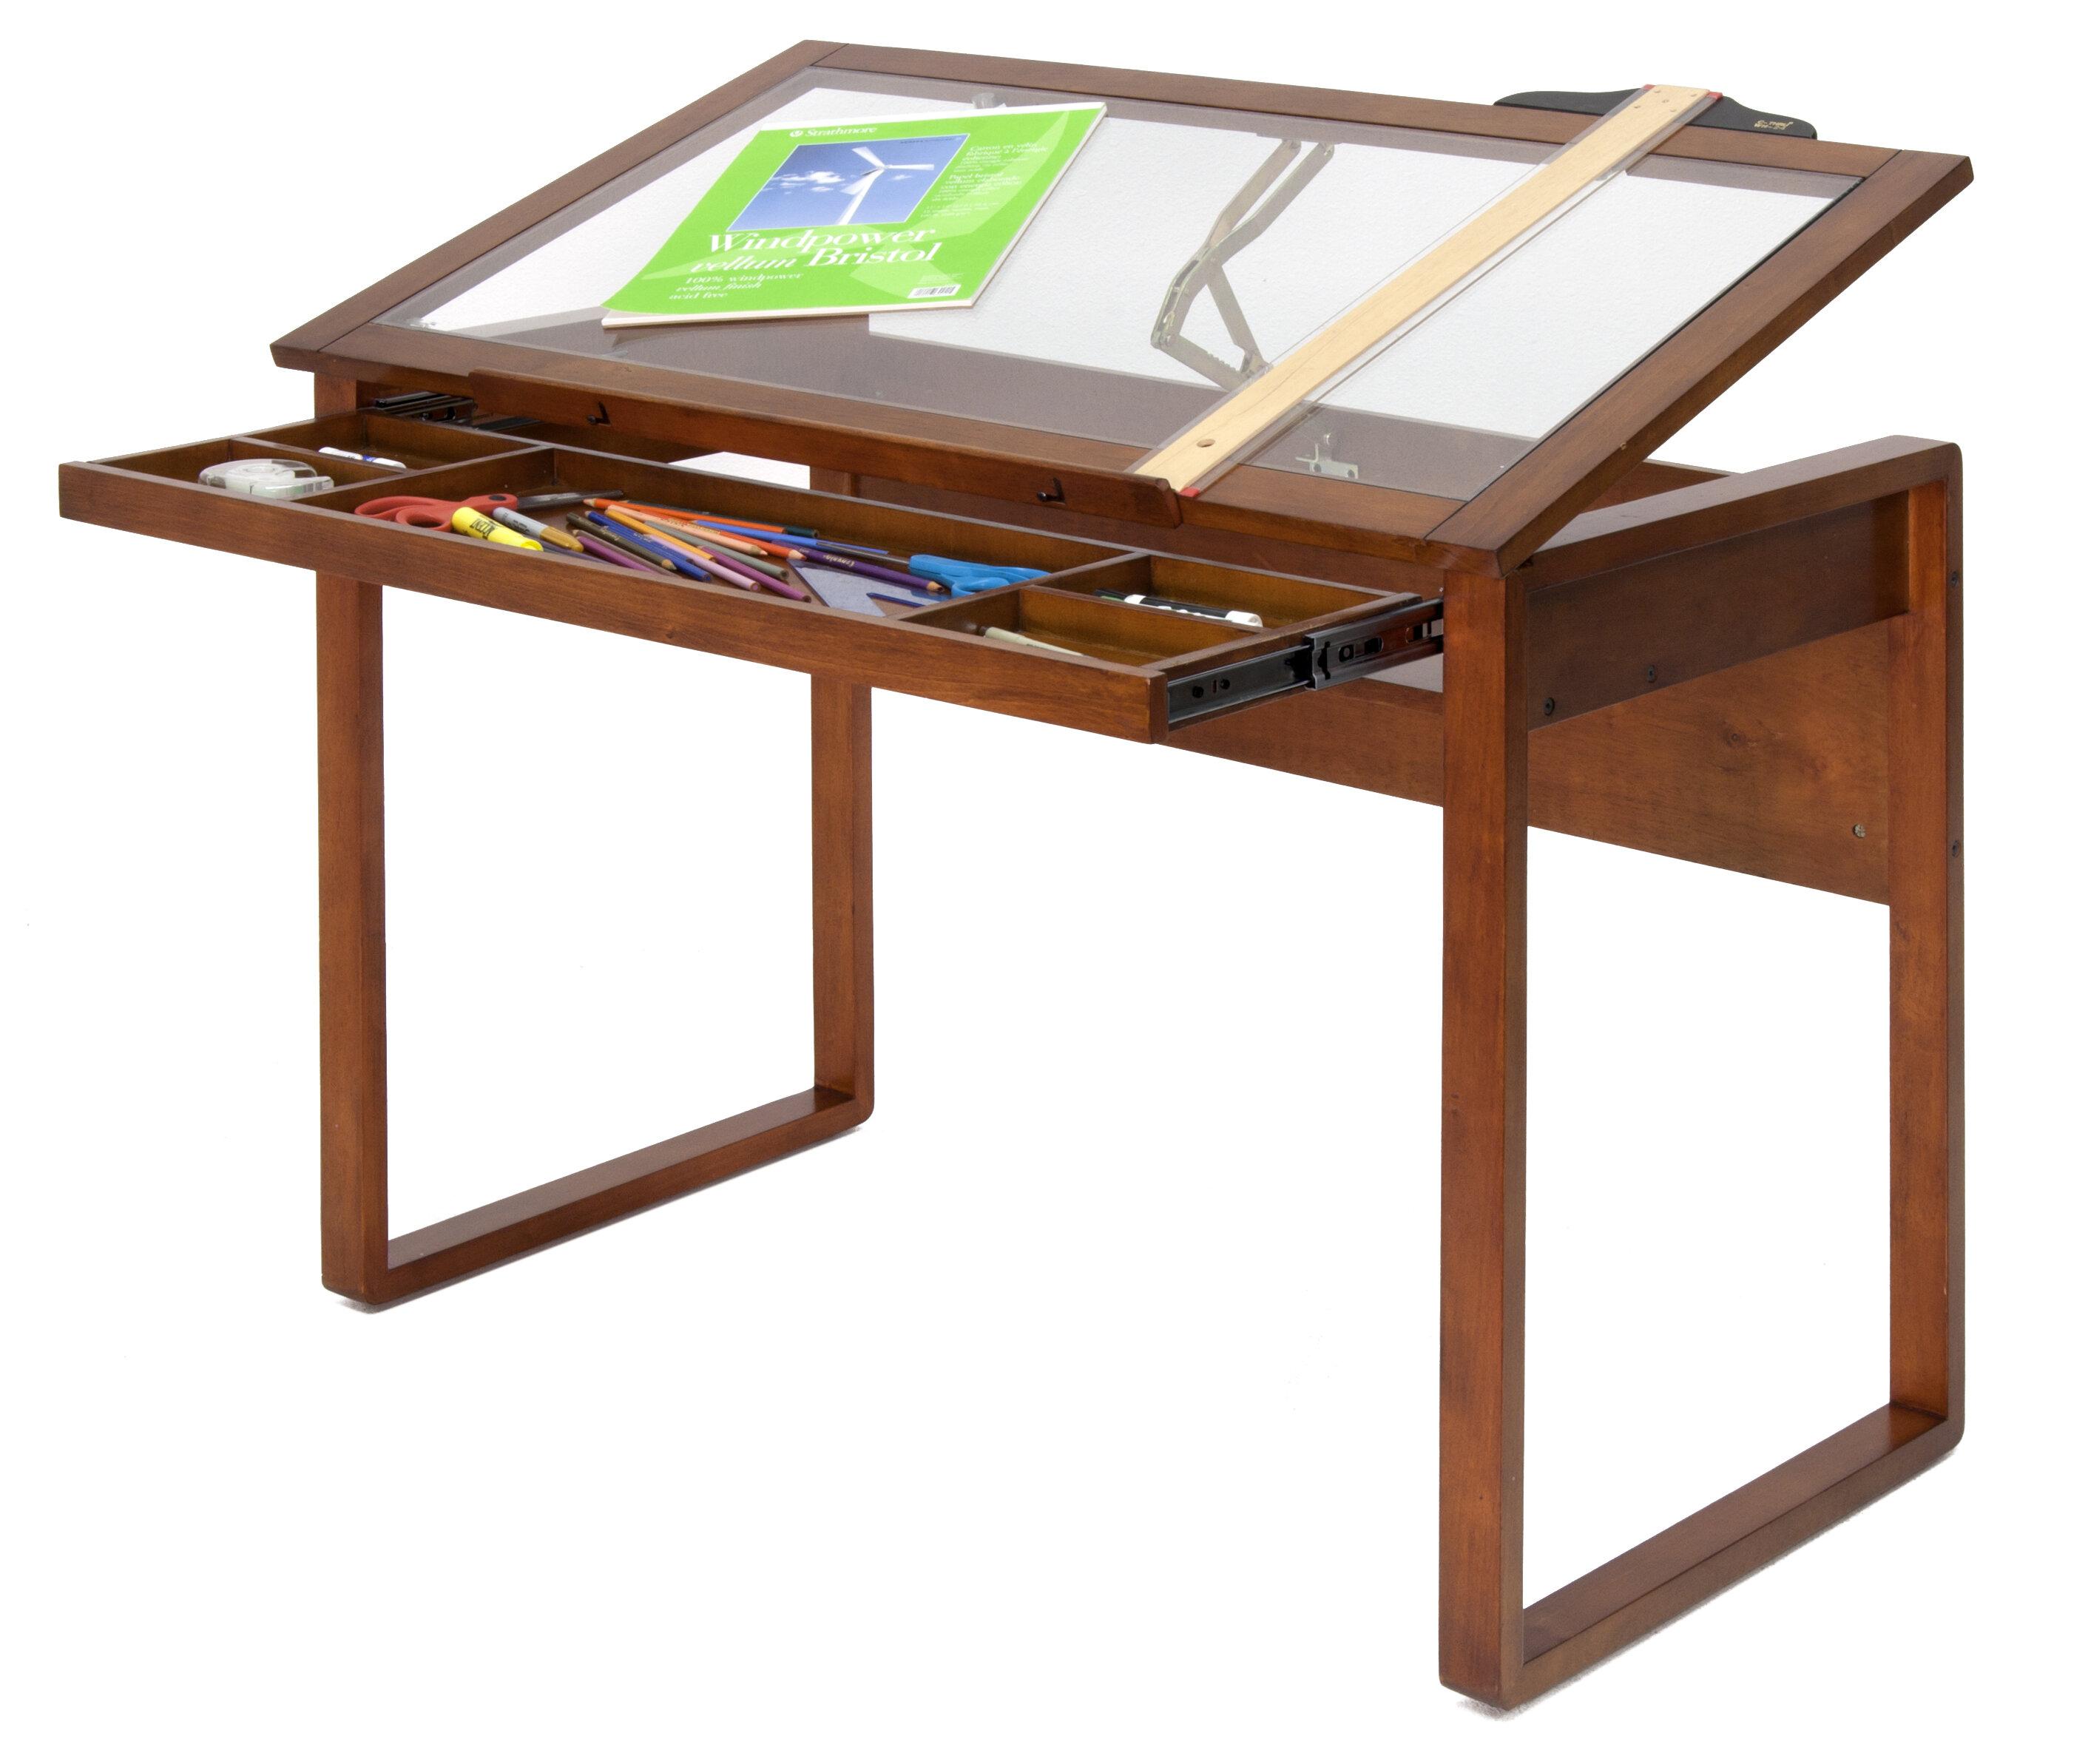 Amazing Ponderosa Adjustable Drafting Table Interior Design Ideas Gentotryabchikinfo